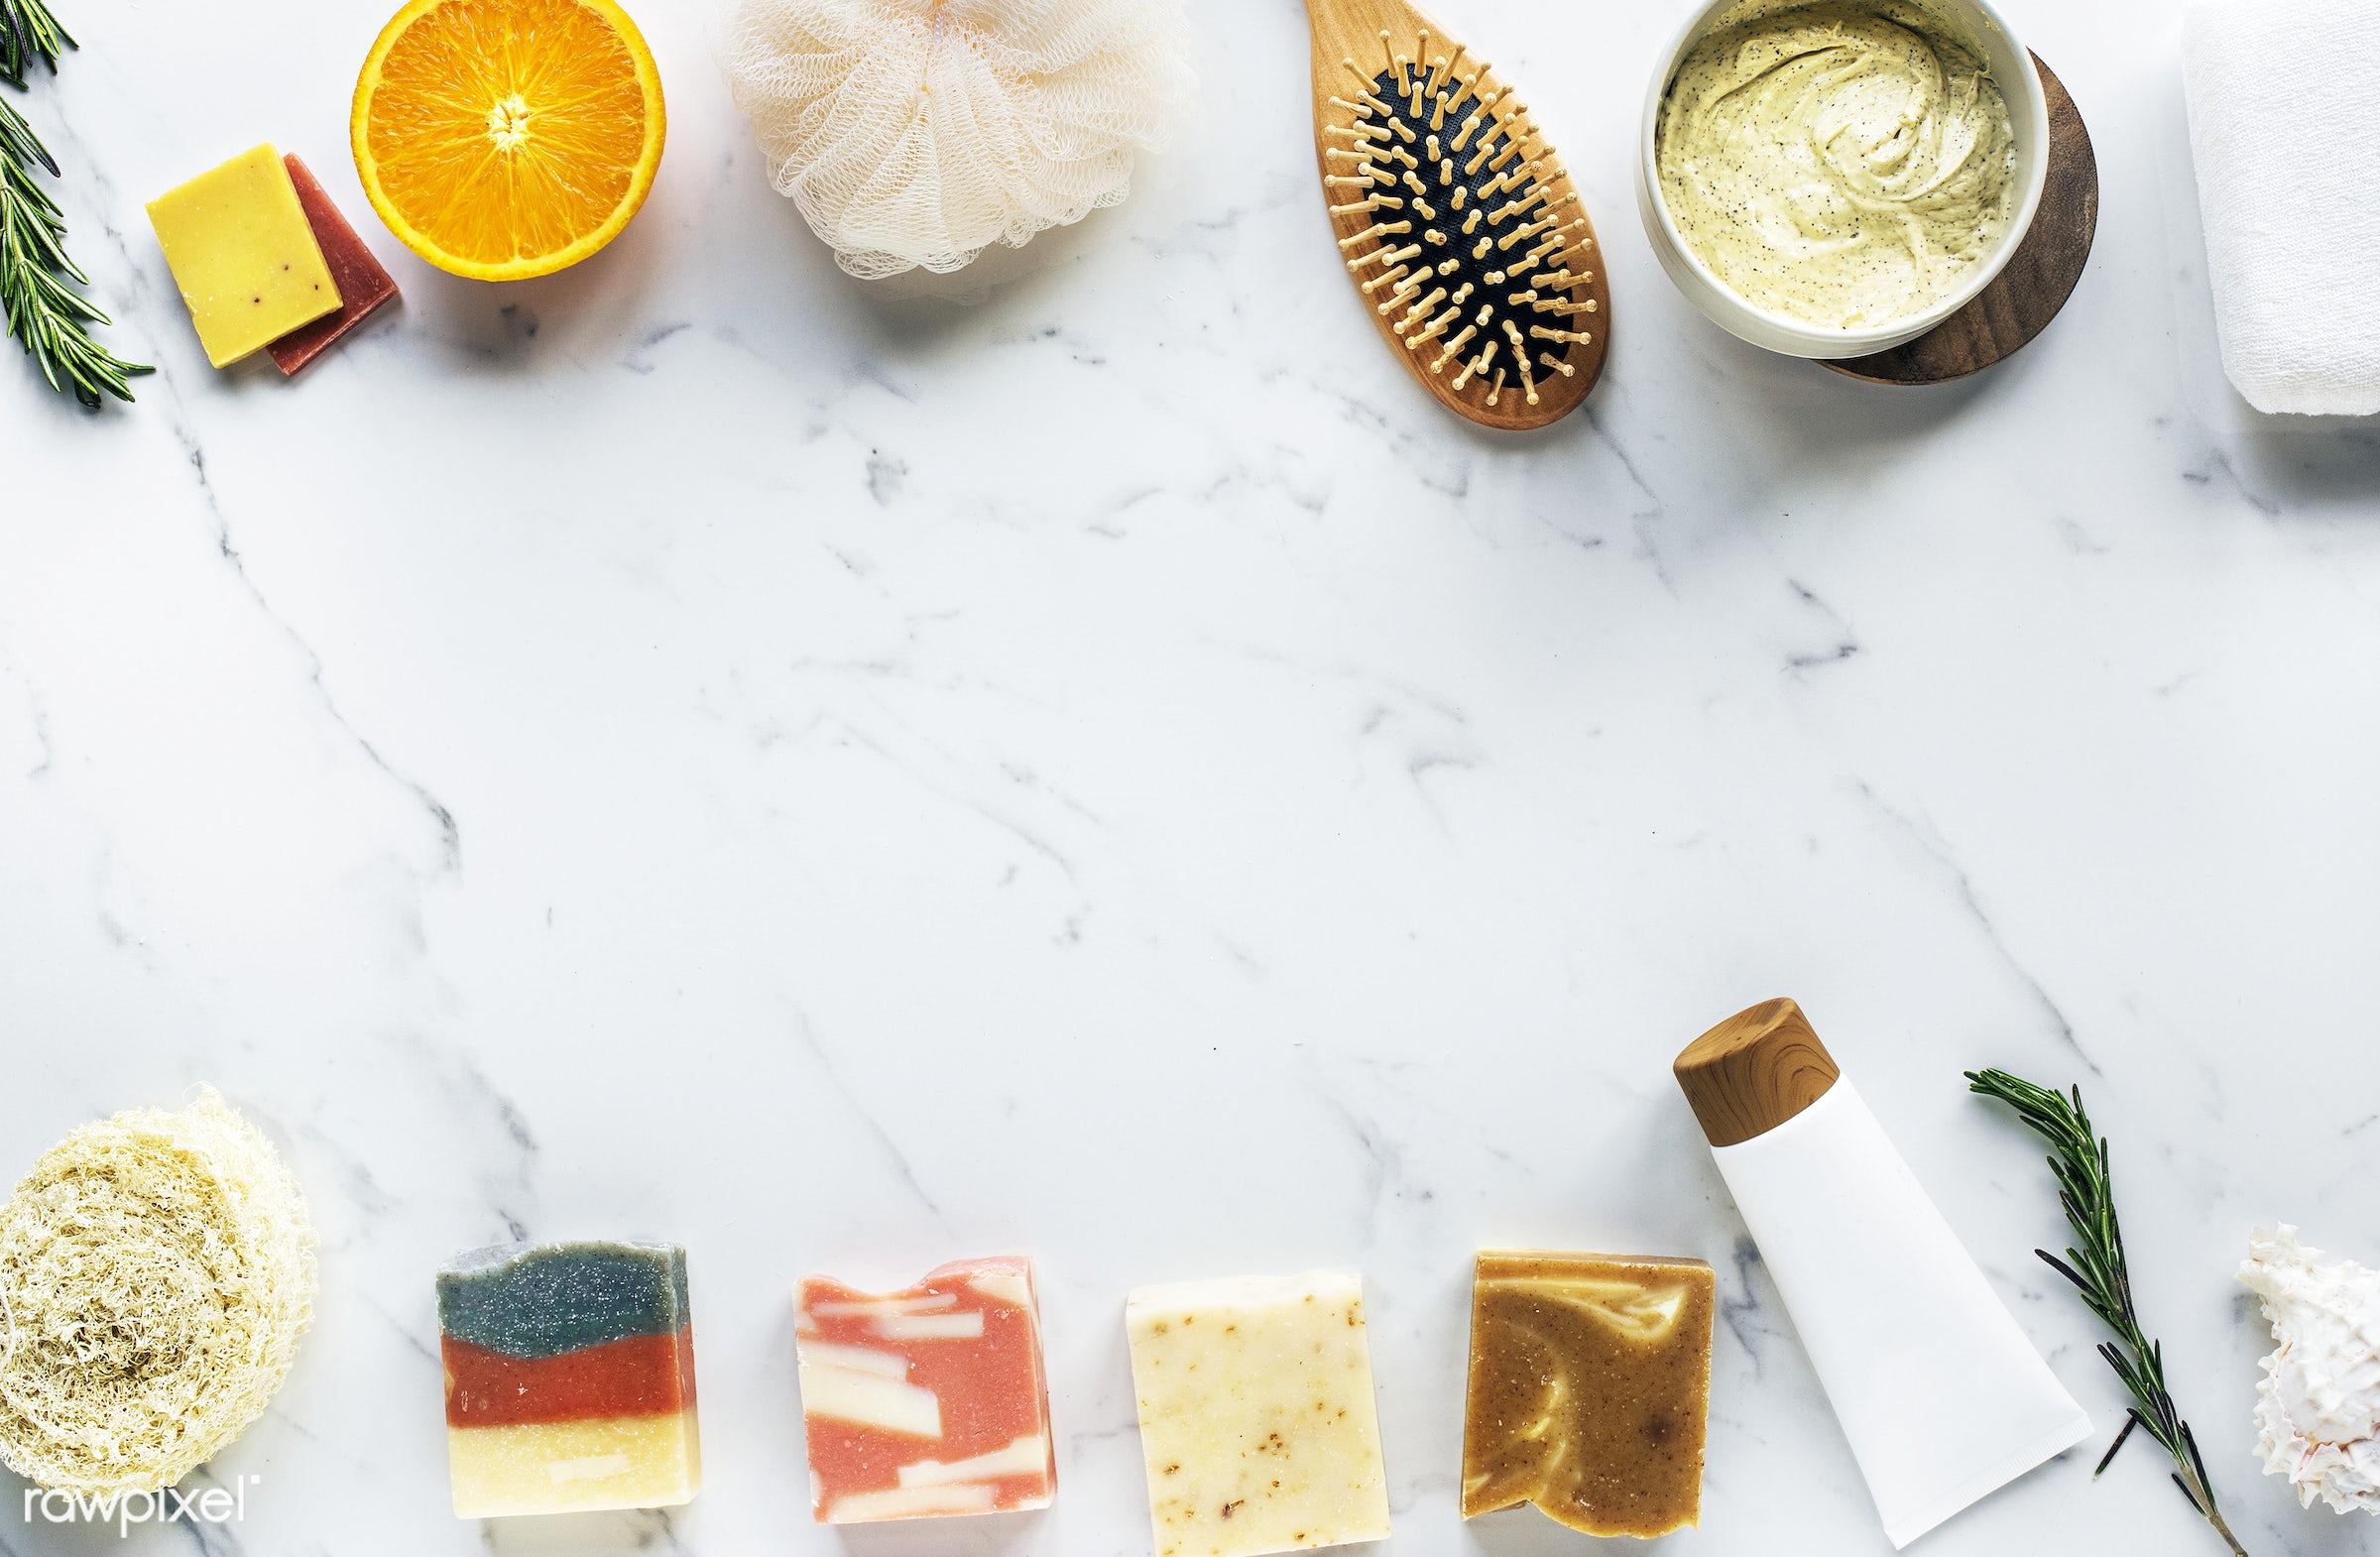 body, aroma, treatment, homemade, clean, fresh, wellness, bath, wash, care, products, spa, hygiene, aromatherapy, handmade,...